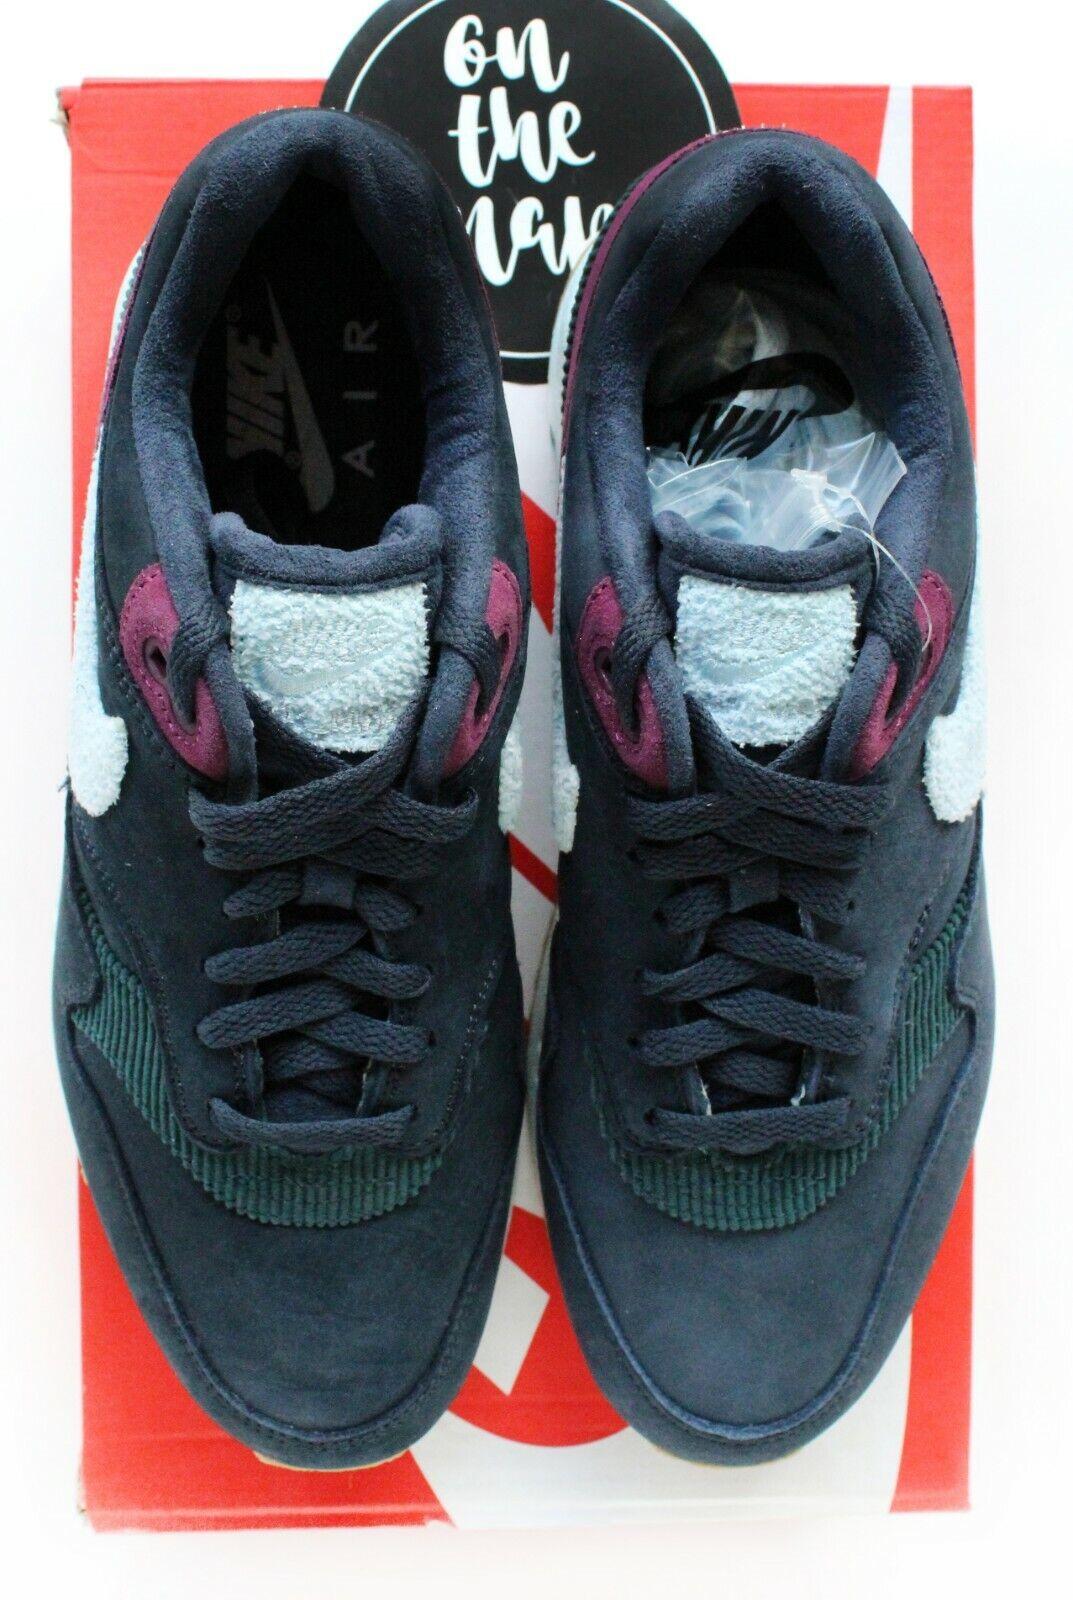 Nike Air Max 1 Crepe Dark Obsidian Blue Cobalt Tint UK 7 US 8 New